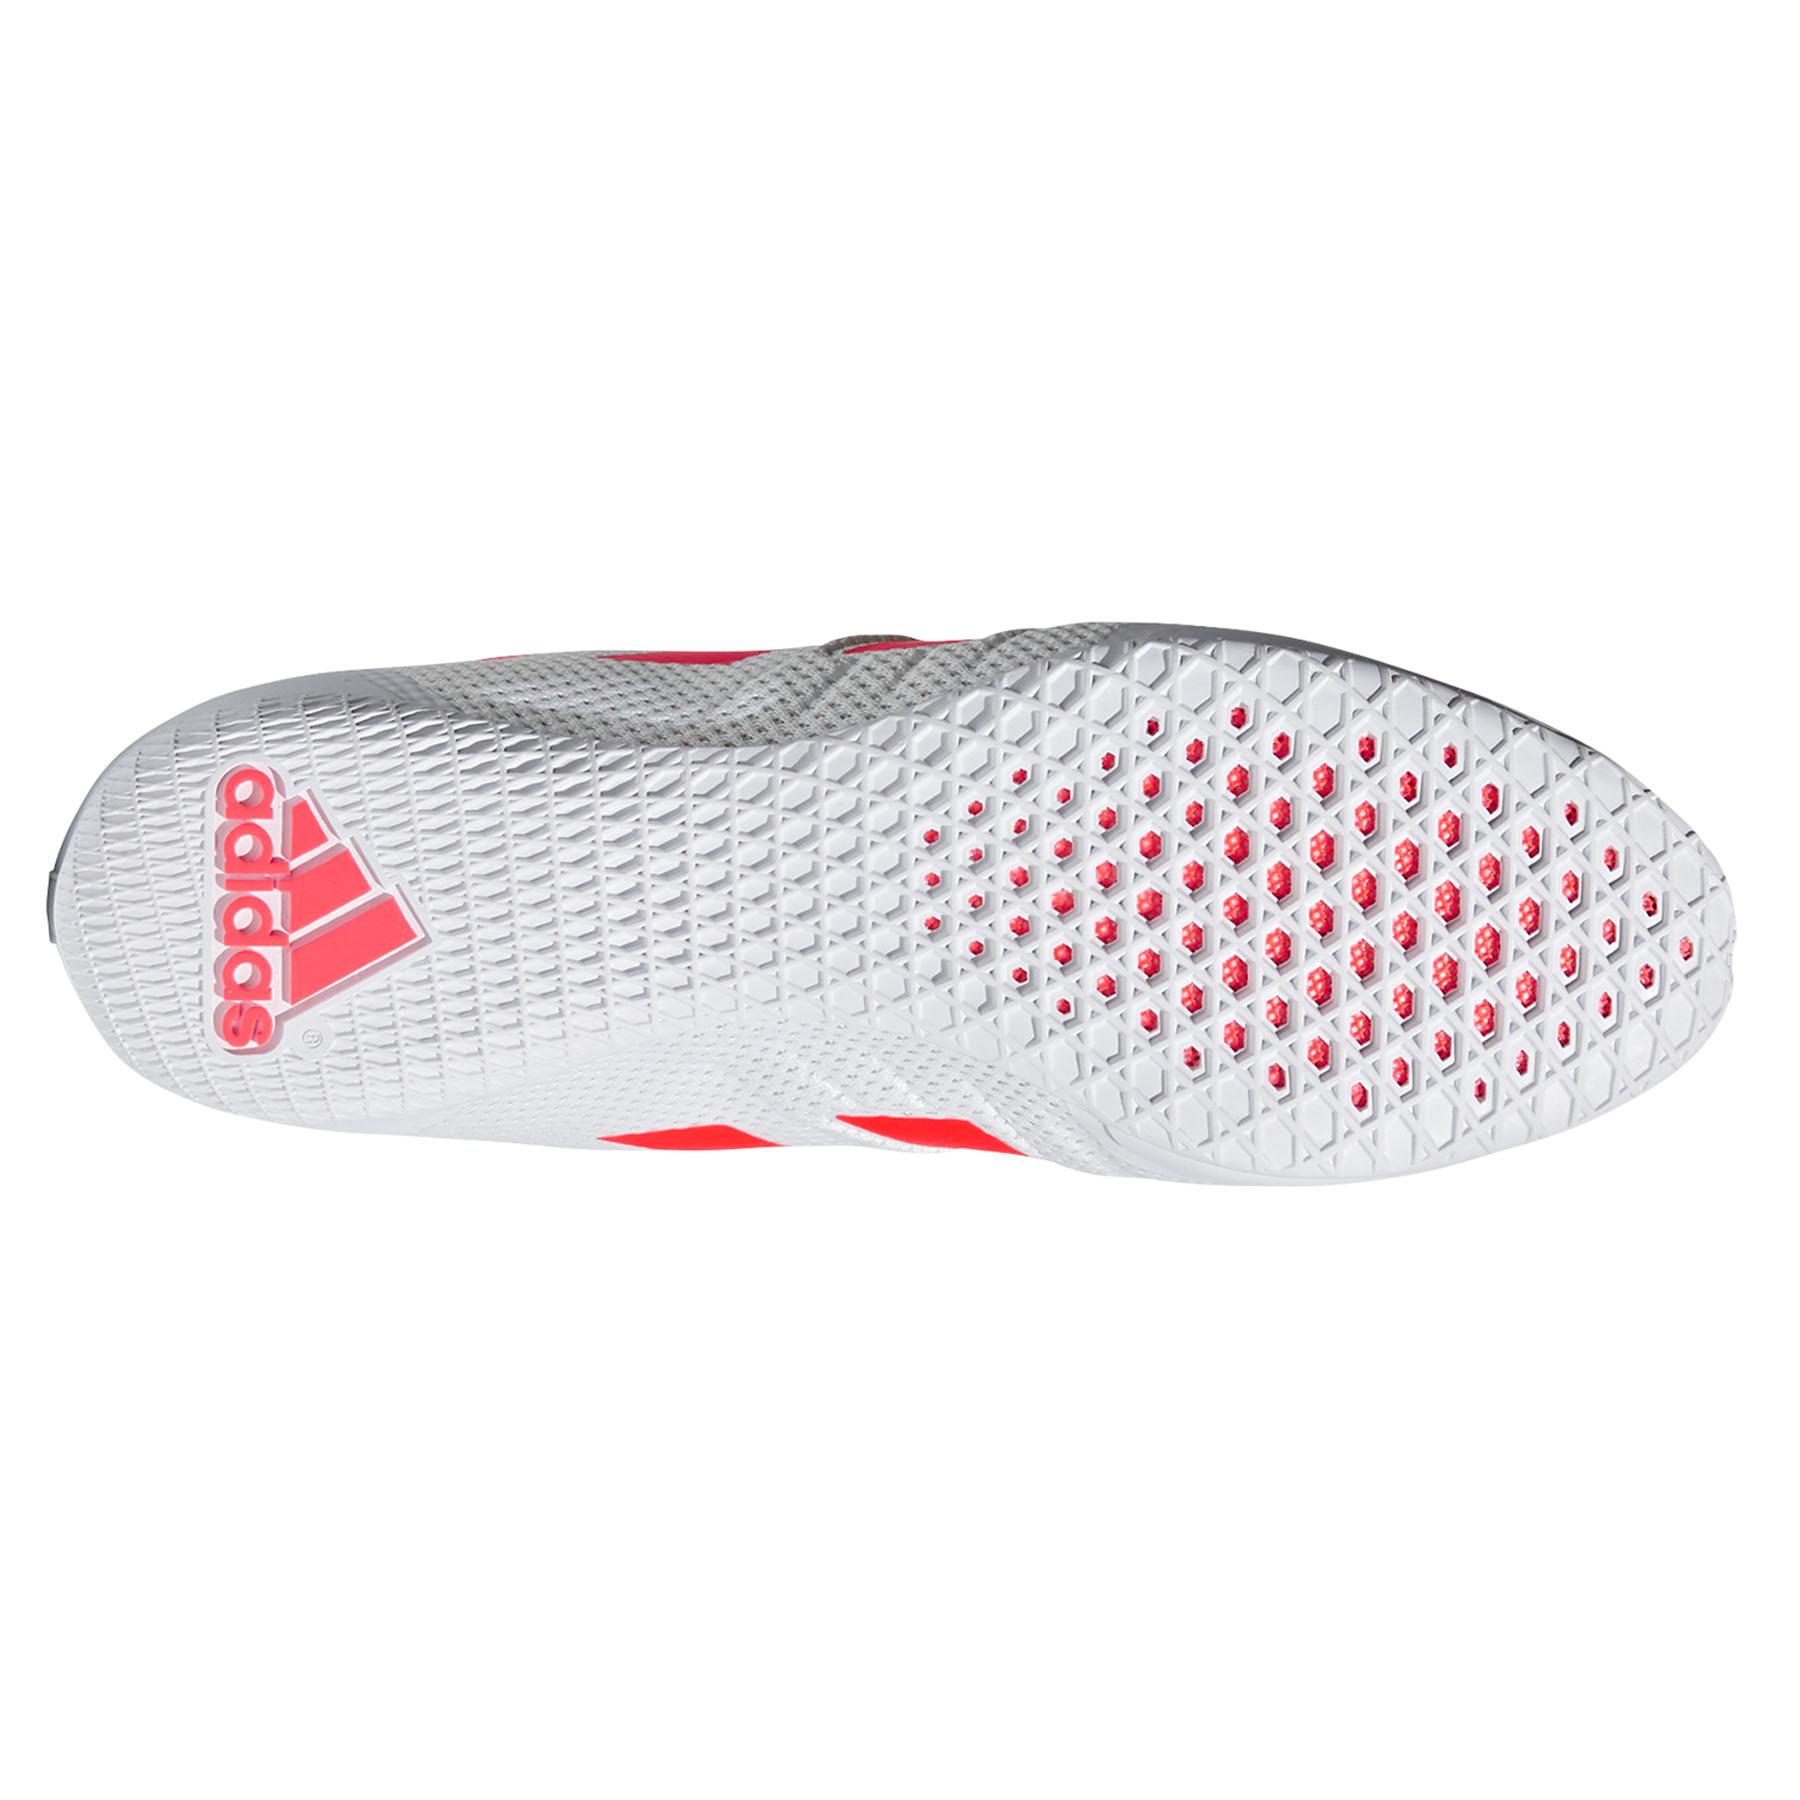 miniature 7 - Adidas speedex 18 Homme Adulte Boxe Trainer Shoe Boot Blanc/Rouge